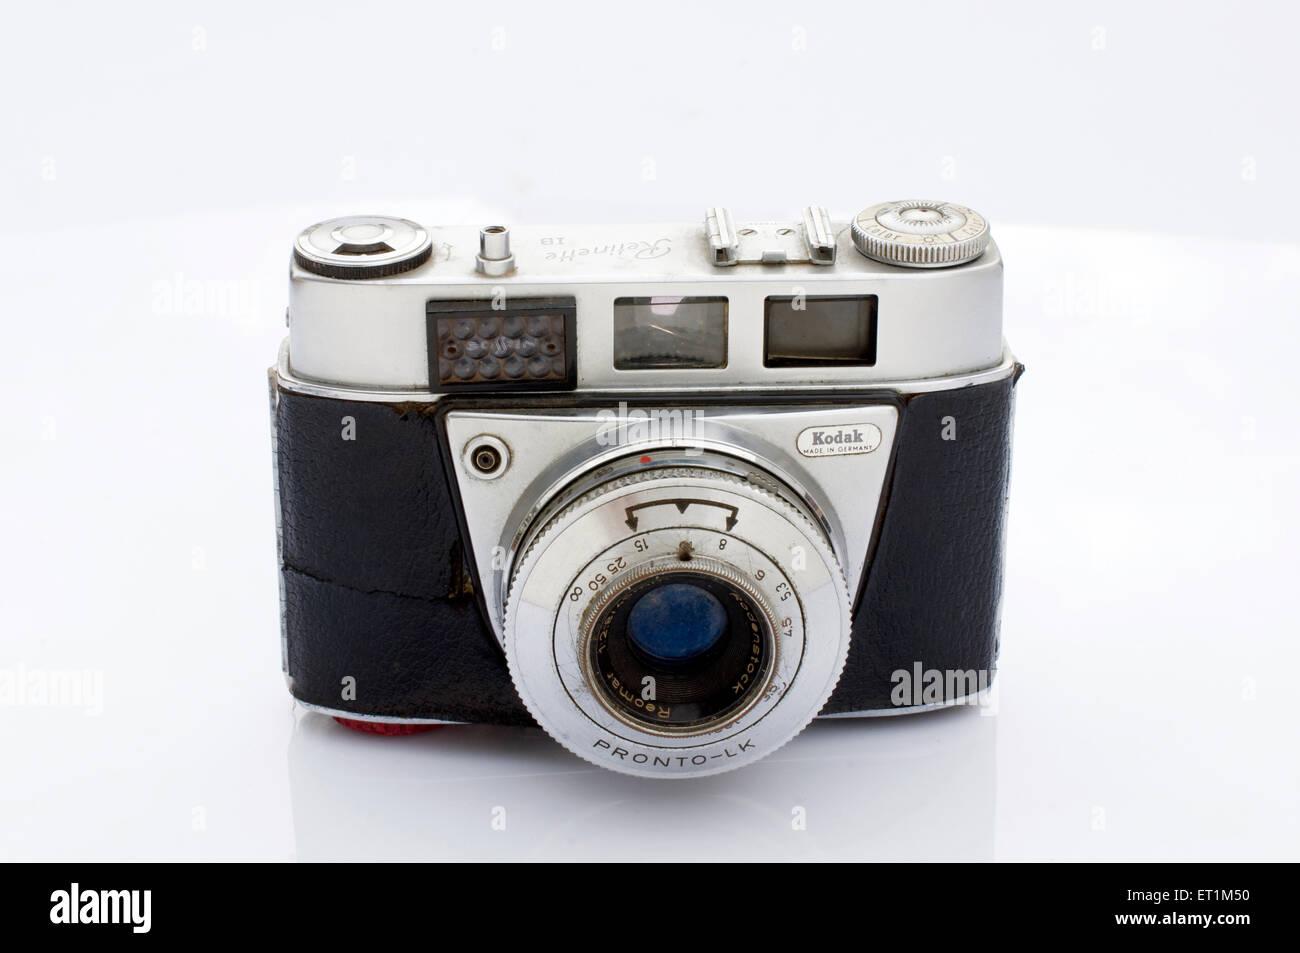 A Kodak Retinette 1B film camera Pune Maharashtra India Asia - Stock Image